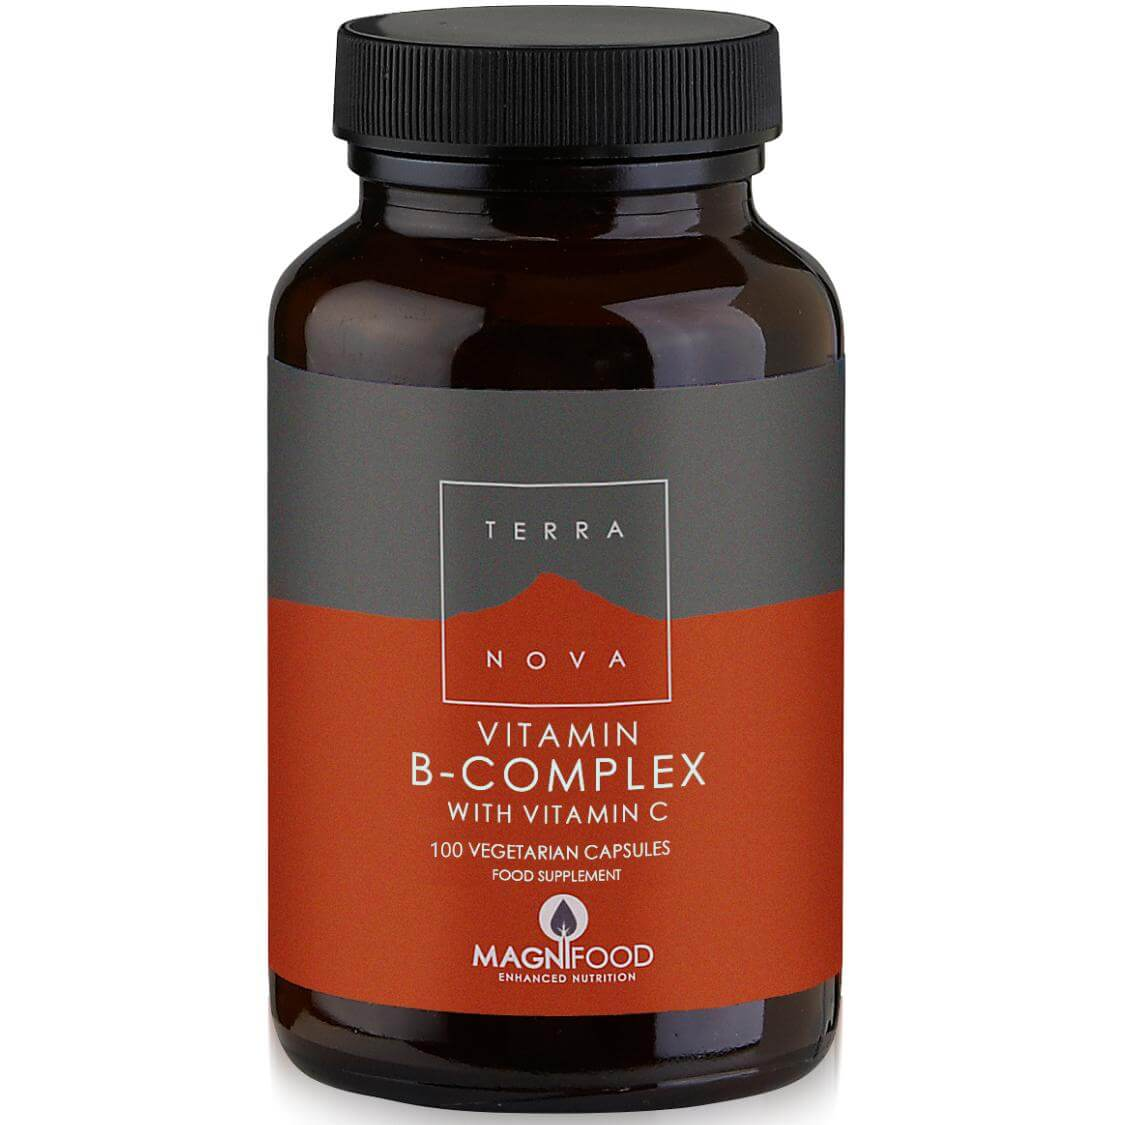 Terranova B-Complexwith Vitamin C για τη Καλύτερη Διαχείριση του Στρεςκαι την Ενίσχυση του Μεταβολισμού 100veg.caps